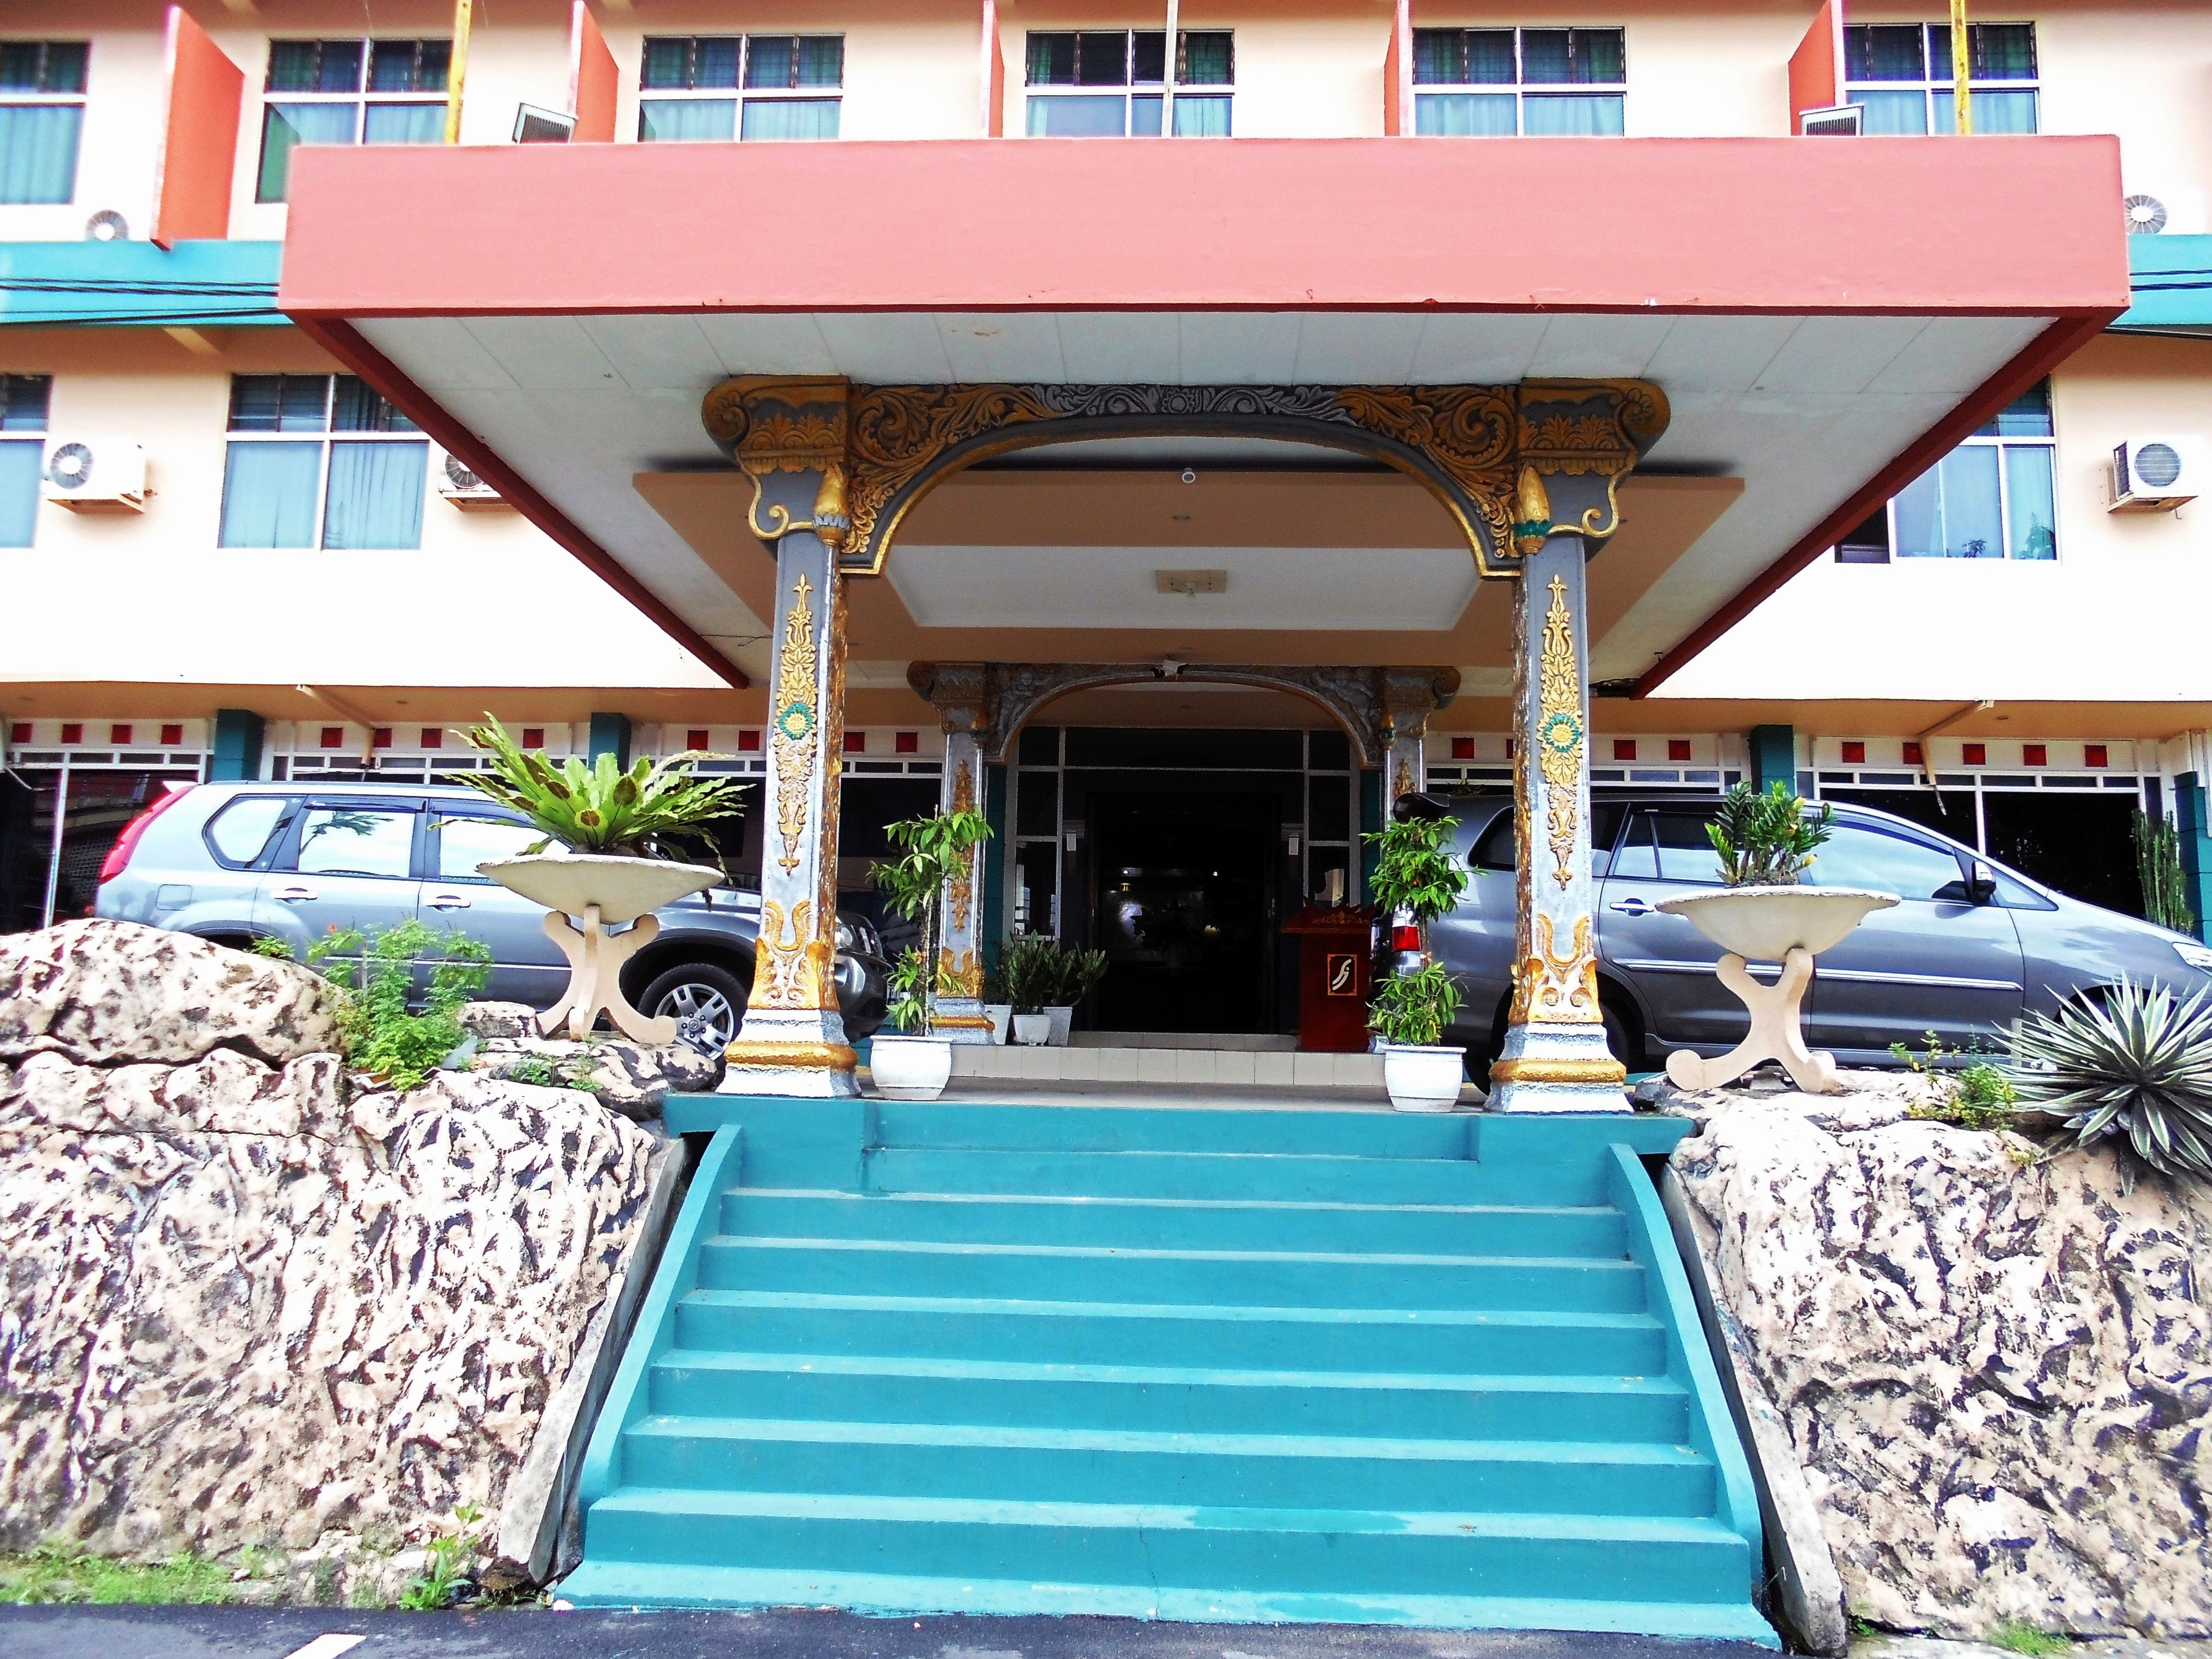 Sampurna Jaya Hotel, Tanjung Pinang